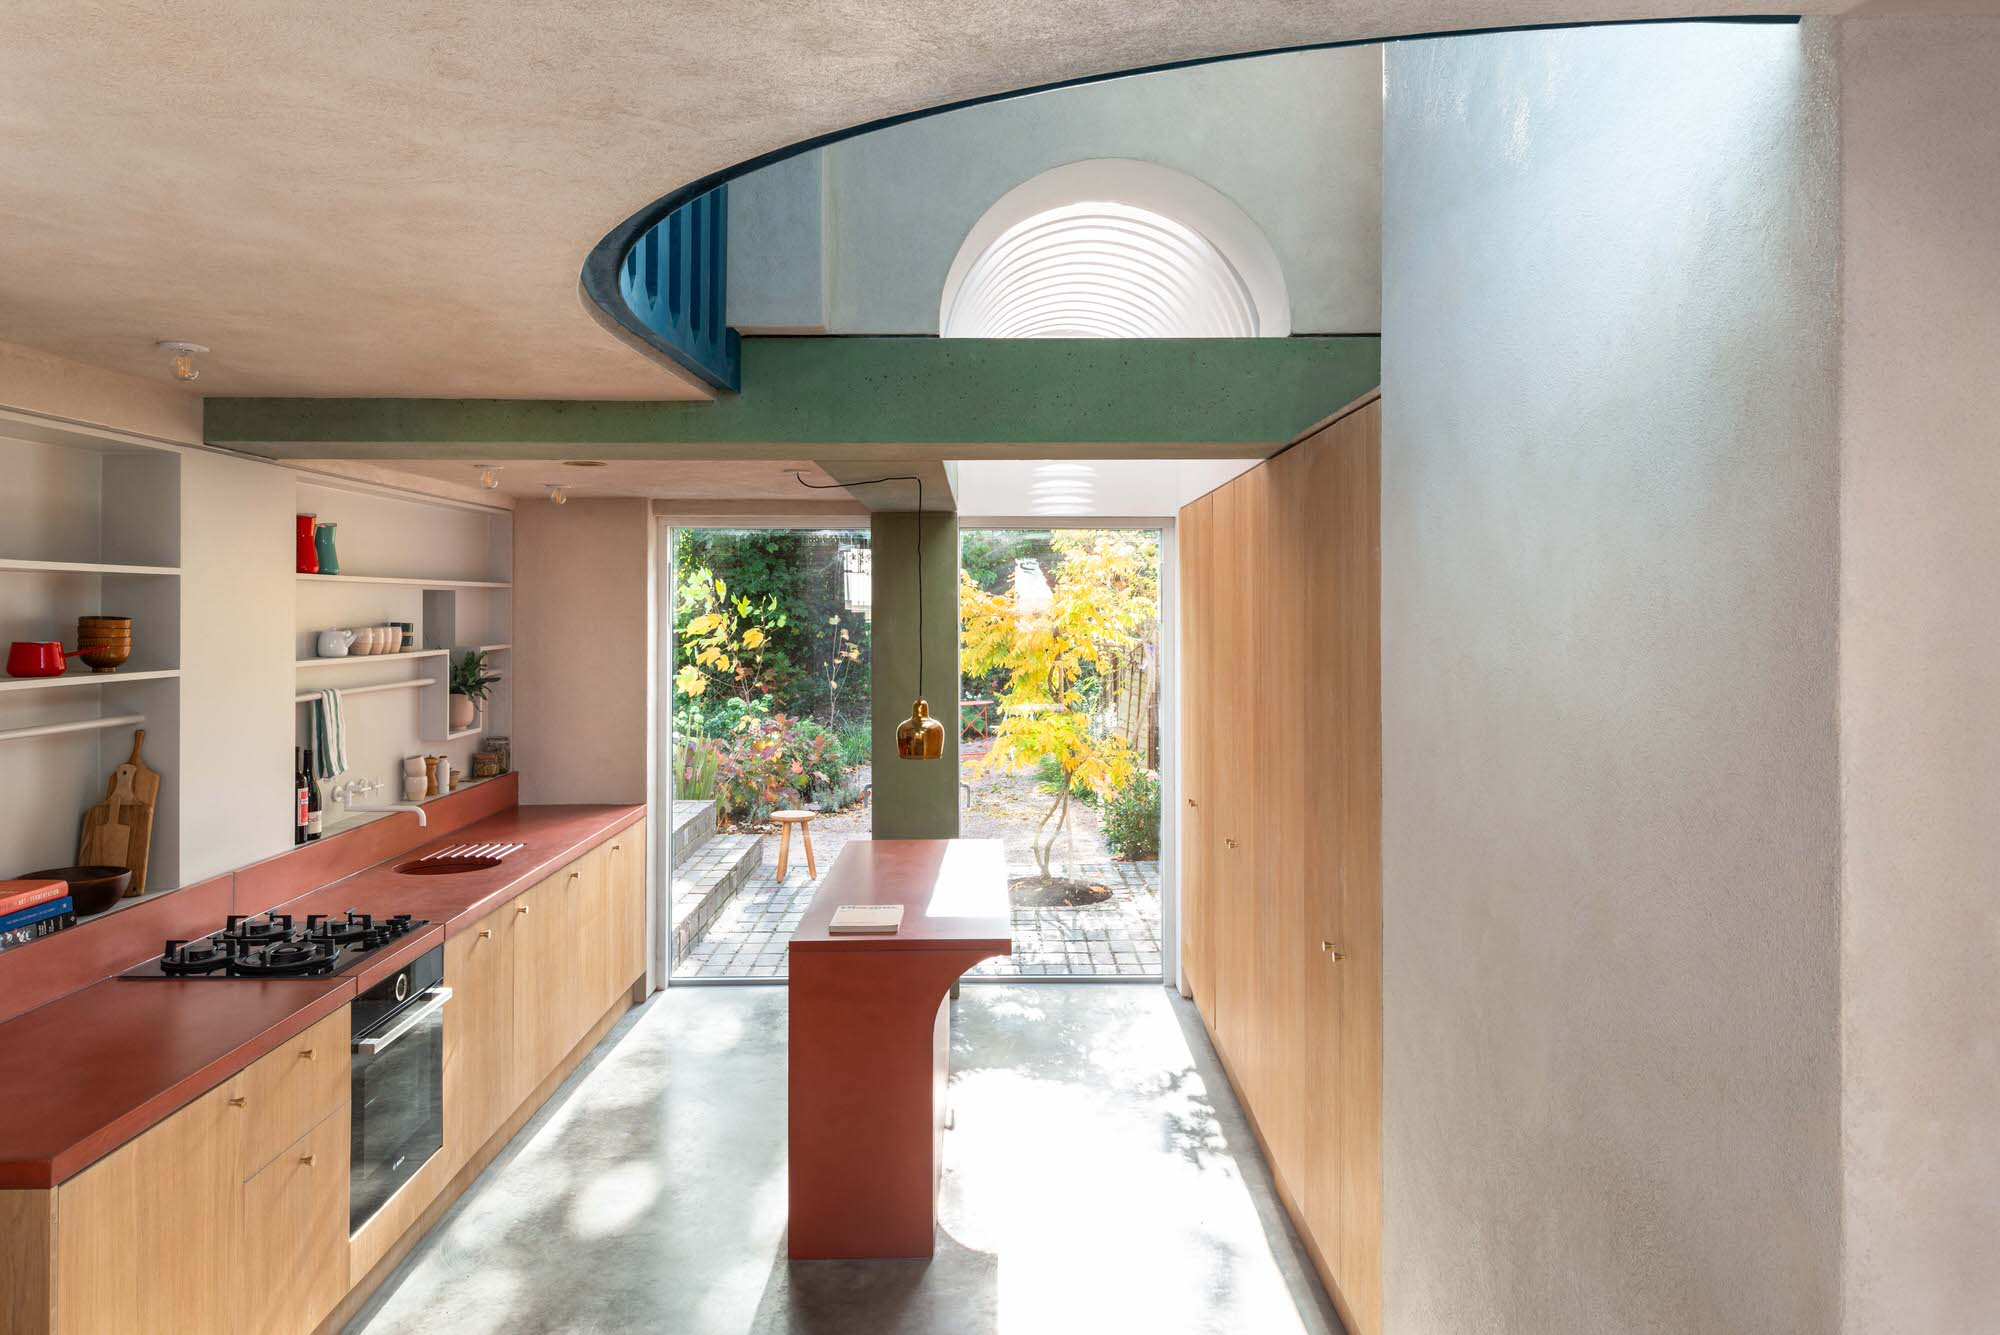 Studio Ben Allen House Recast London Residential Architecture Photo French+tye Yellowtrace 01